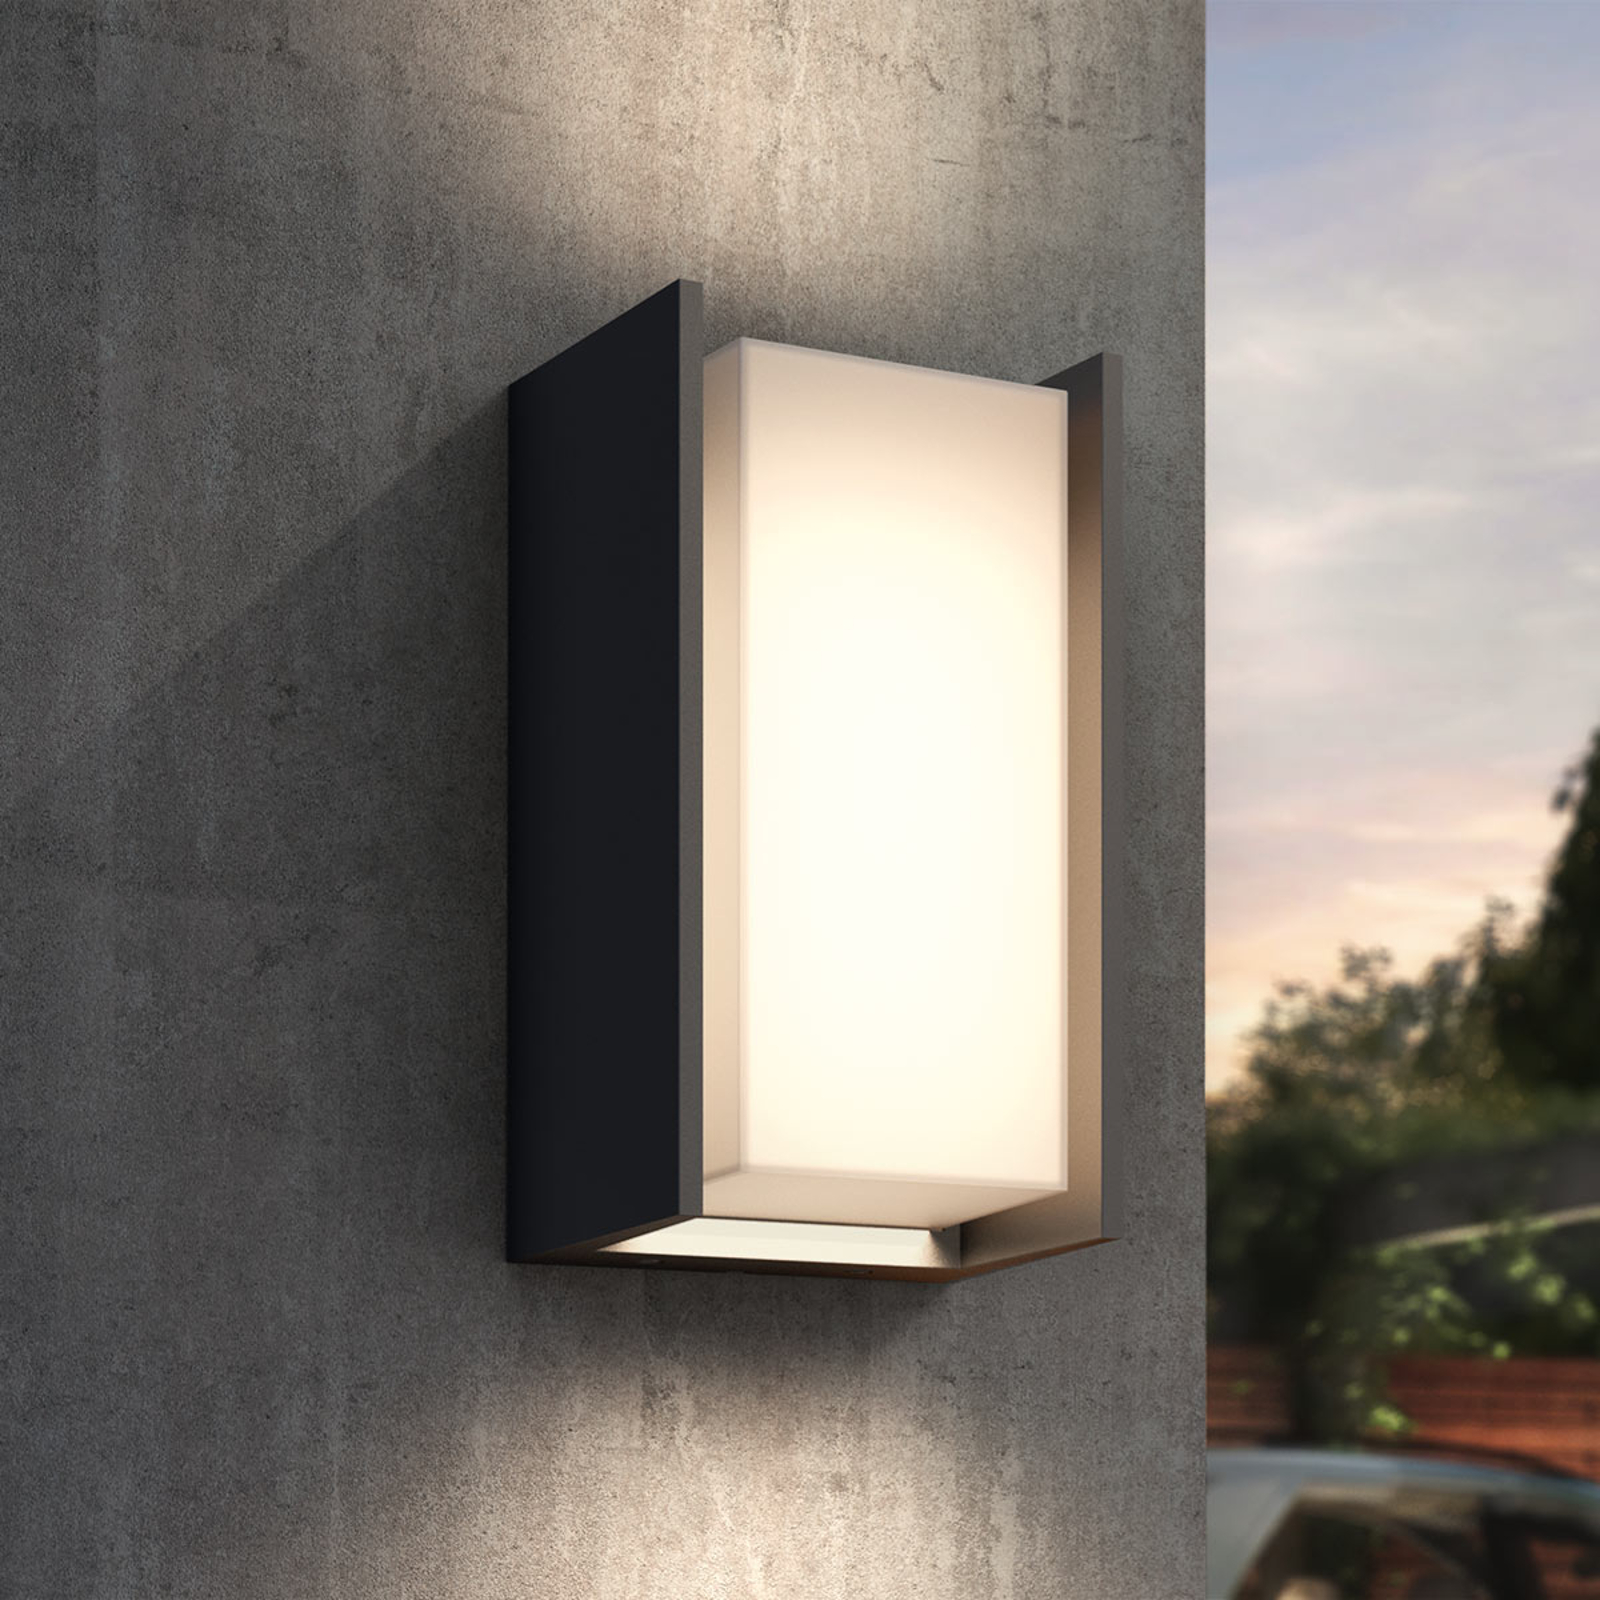 Philips Hue kinkiet zewnętrzny LED Turaco